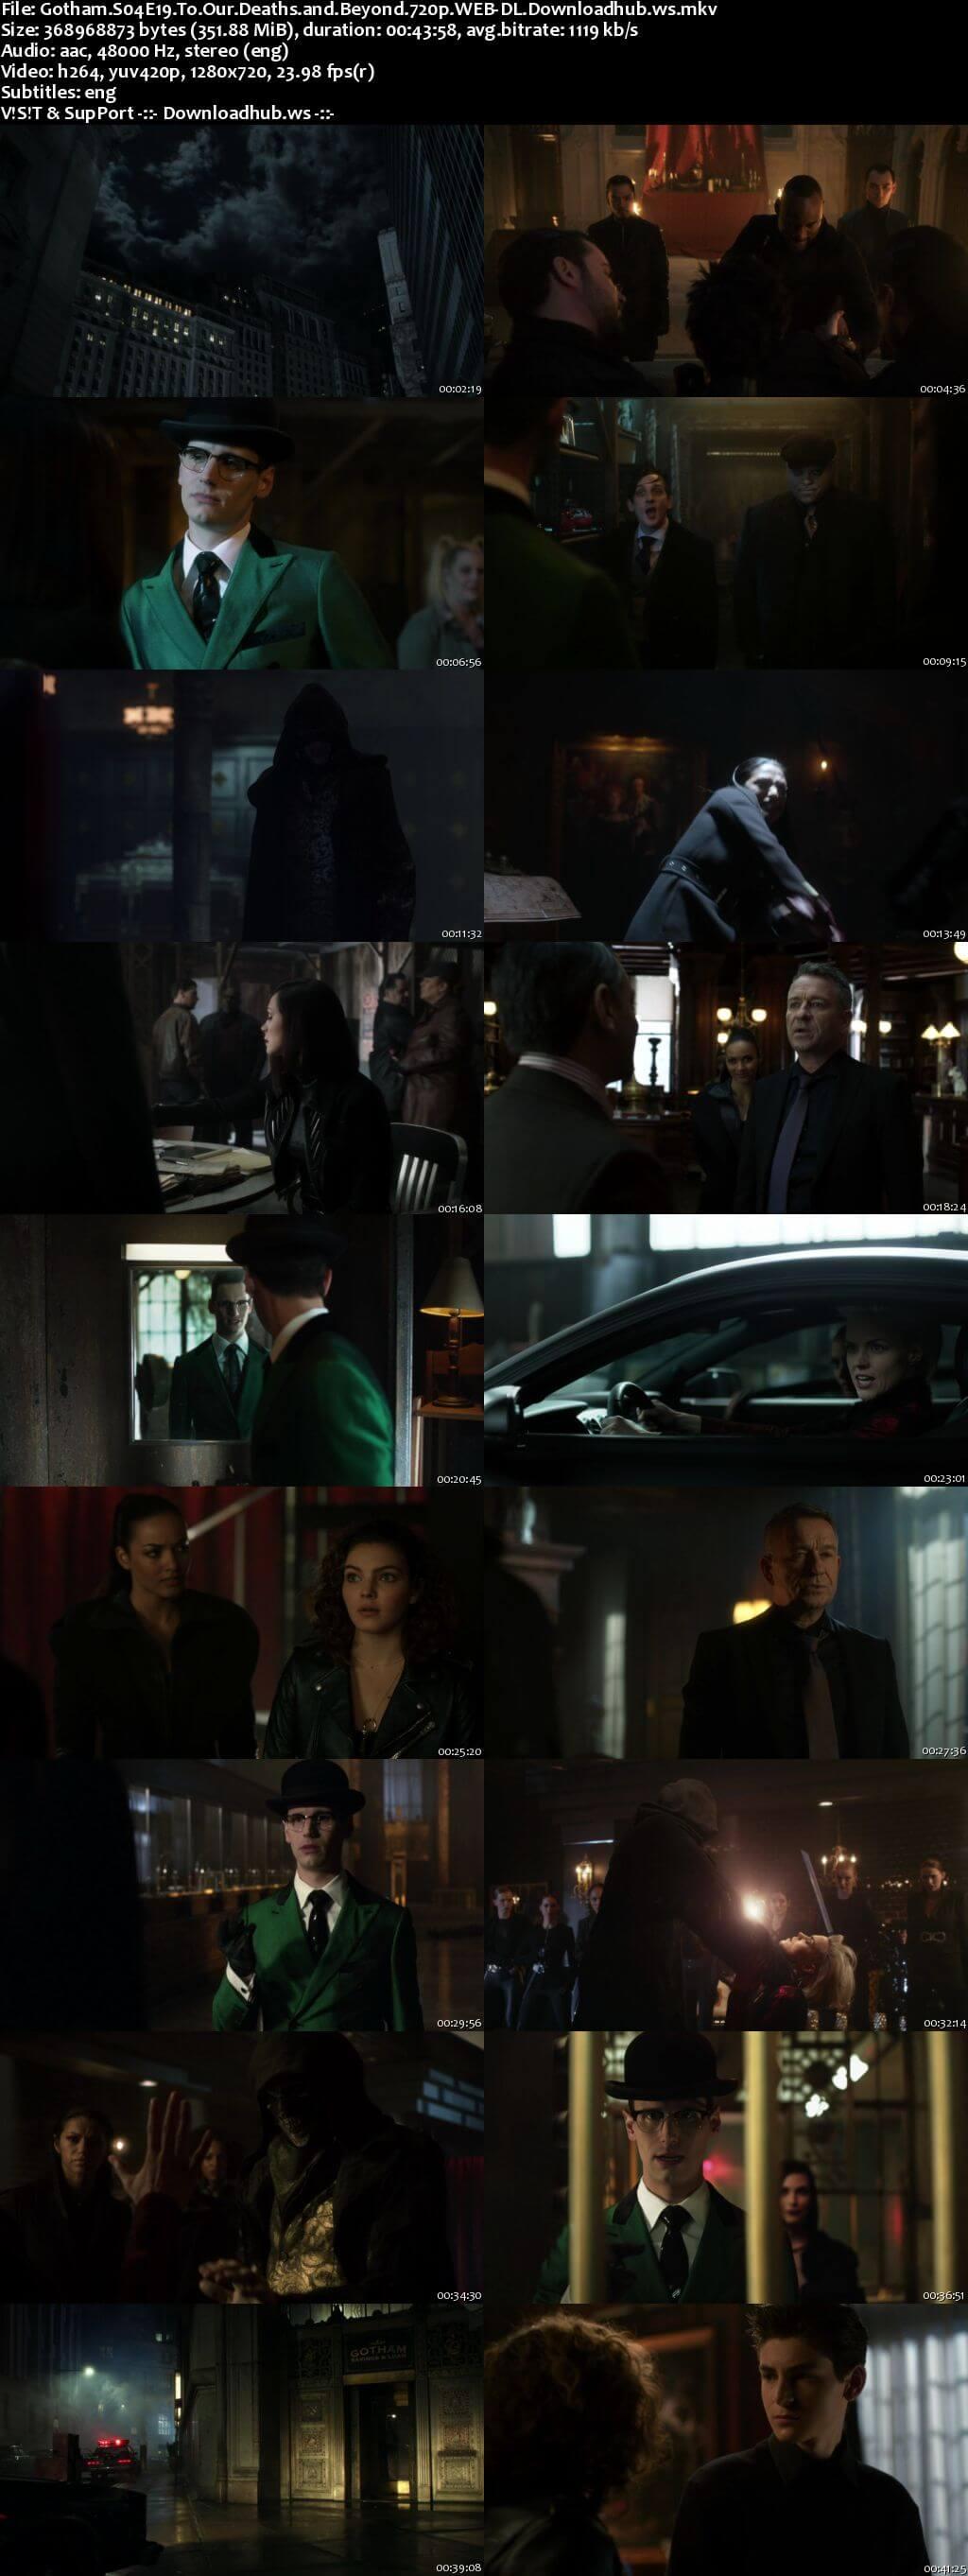 Gotham S04E19 350MB Web-DL 720p x264 ESubs